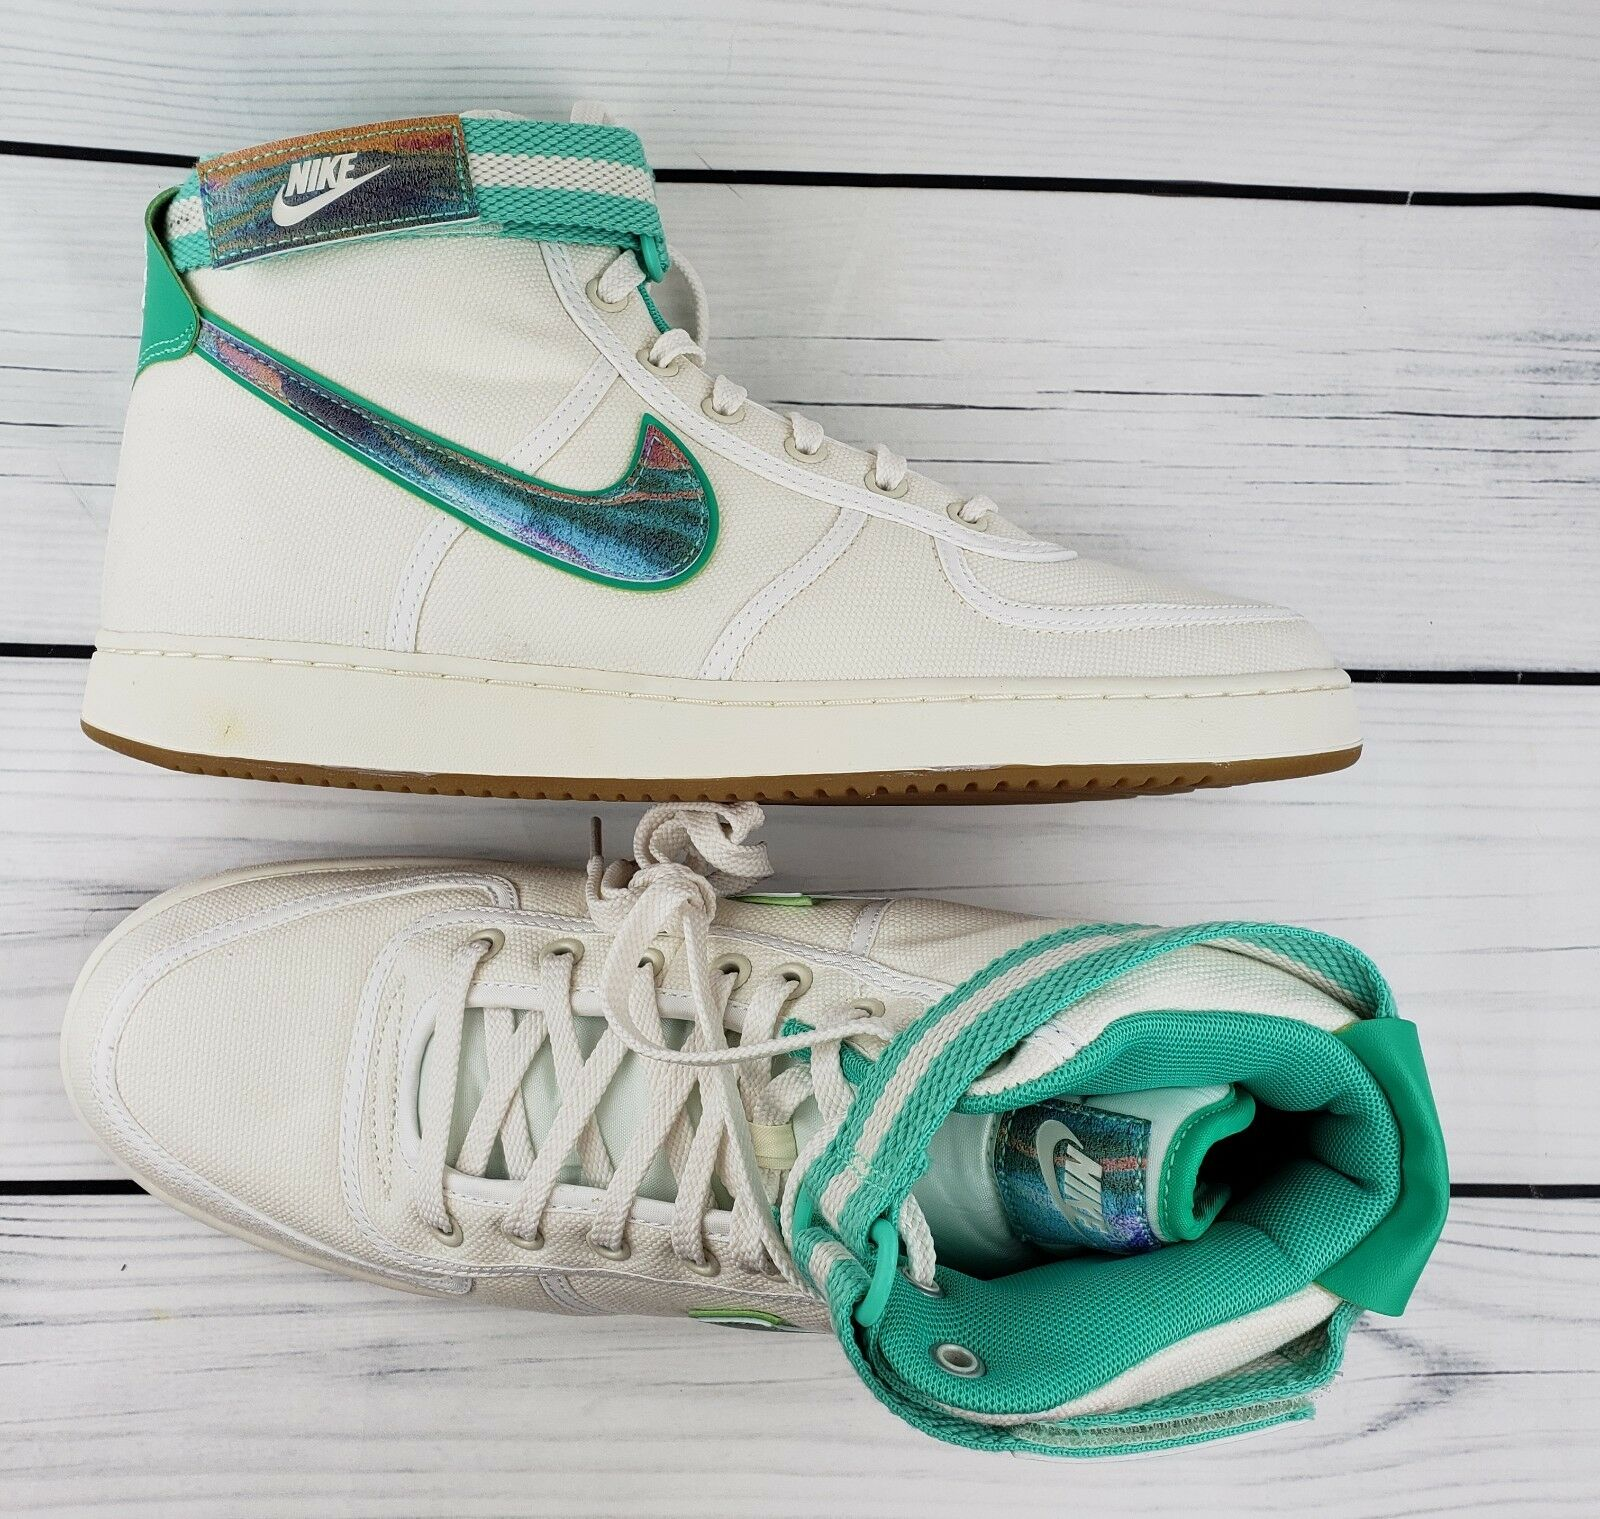 Nike Vandal High Supreme TD Men's AQ5643-100 Size 10.5